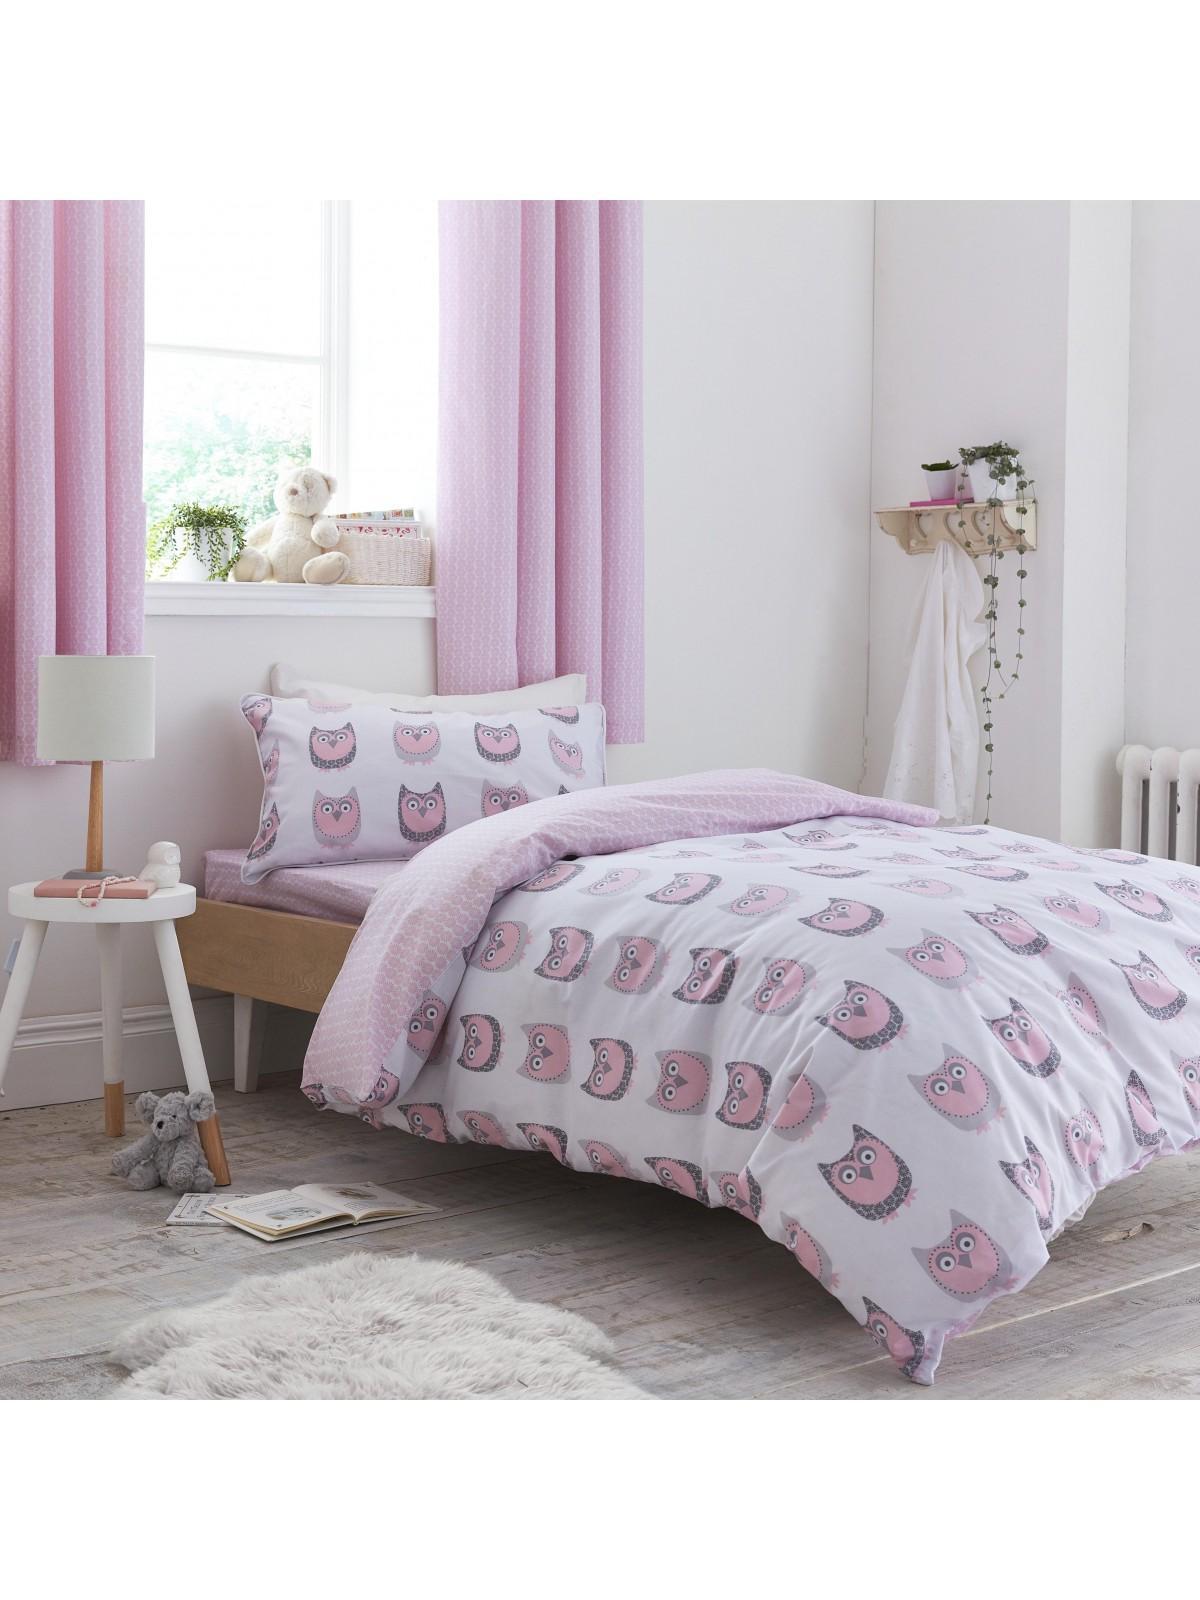 curtans sets blush cover duvet alford